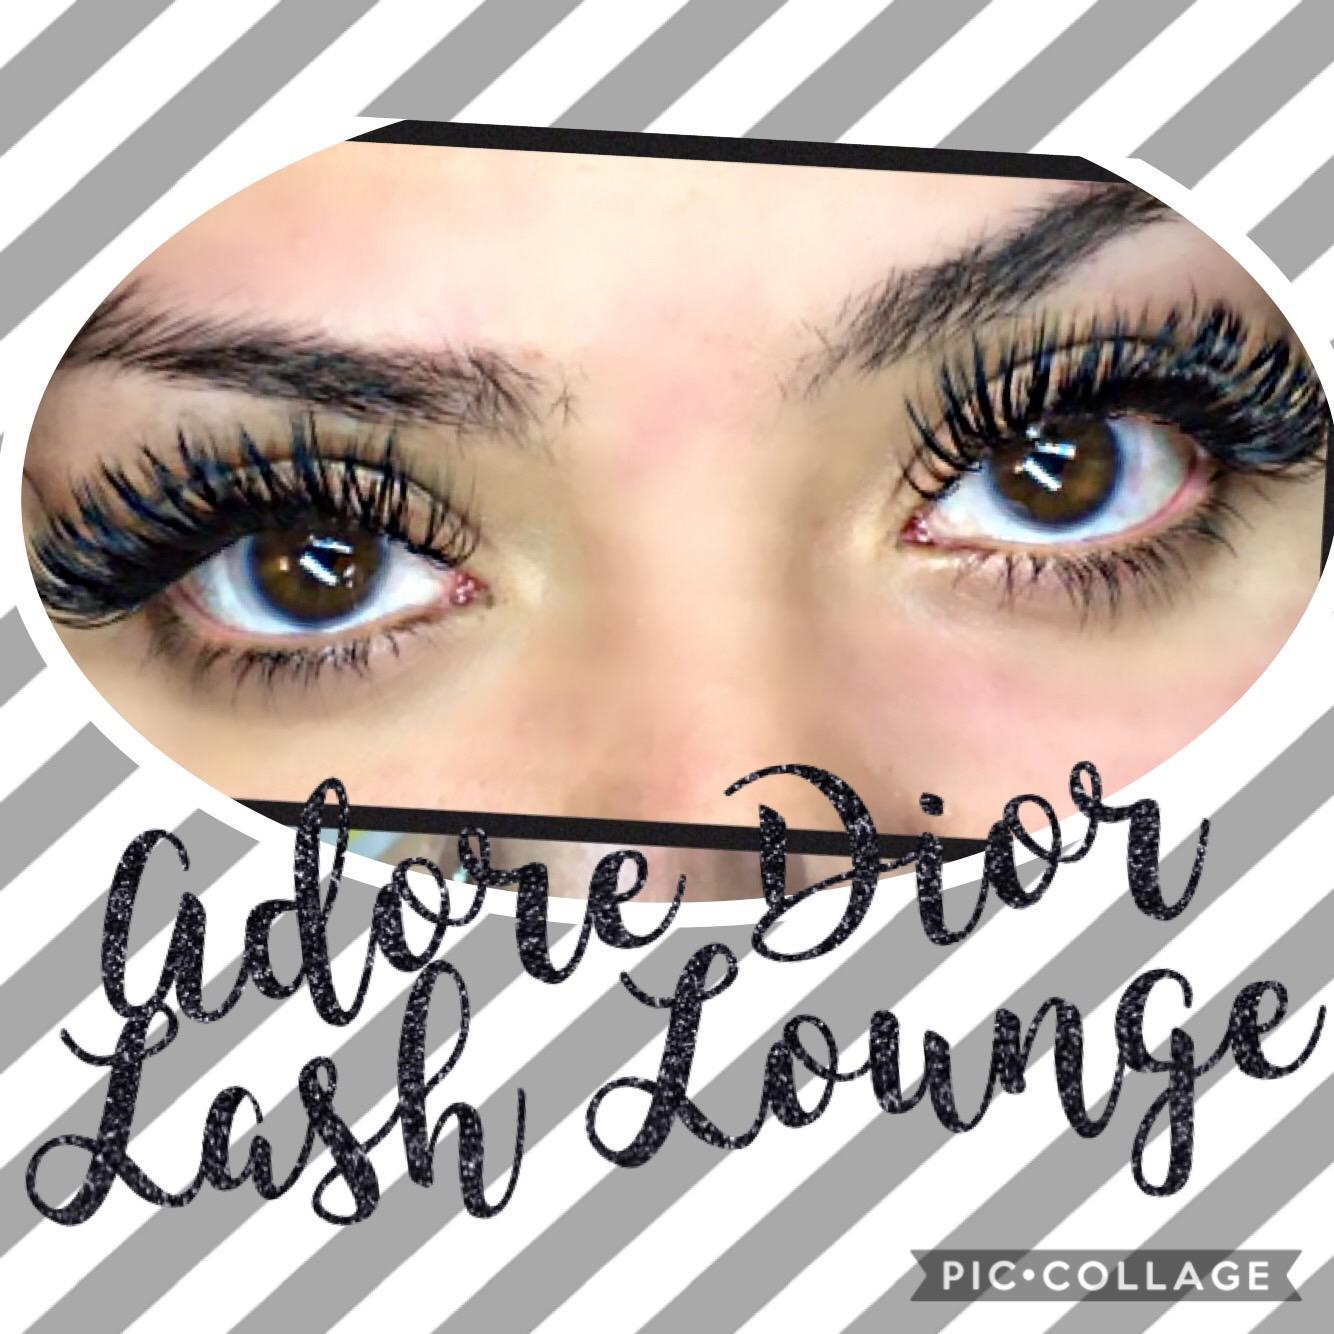 Adore DiorLash Lounge